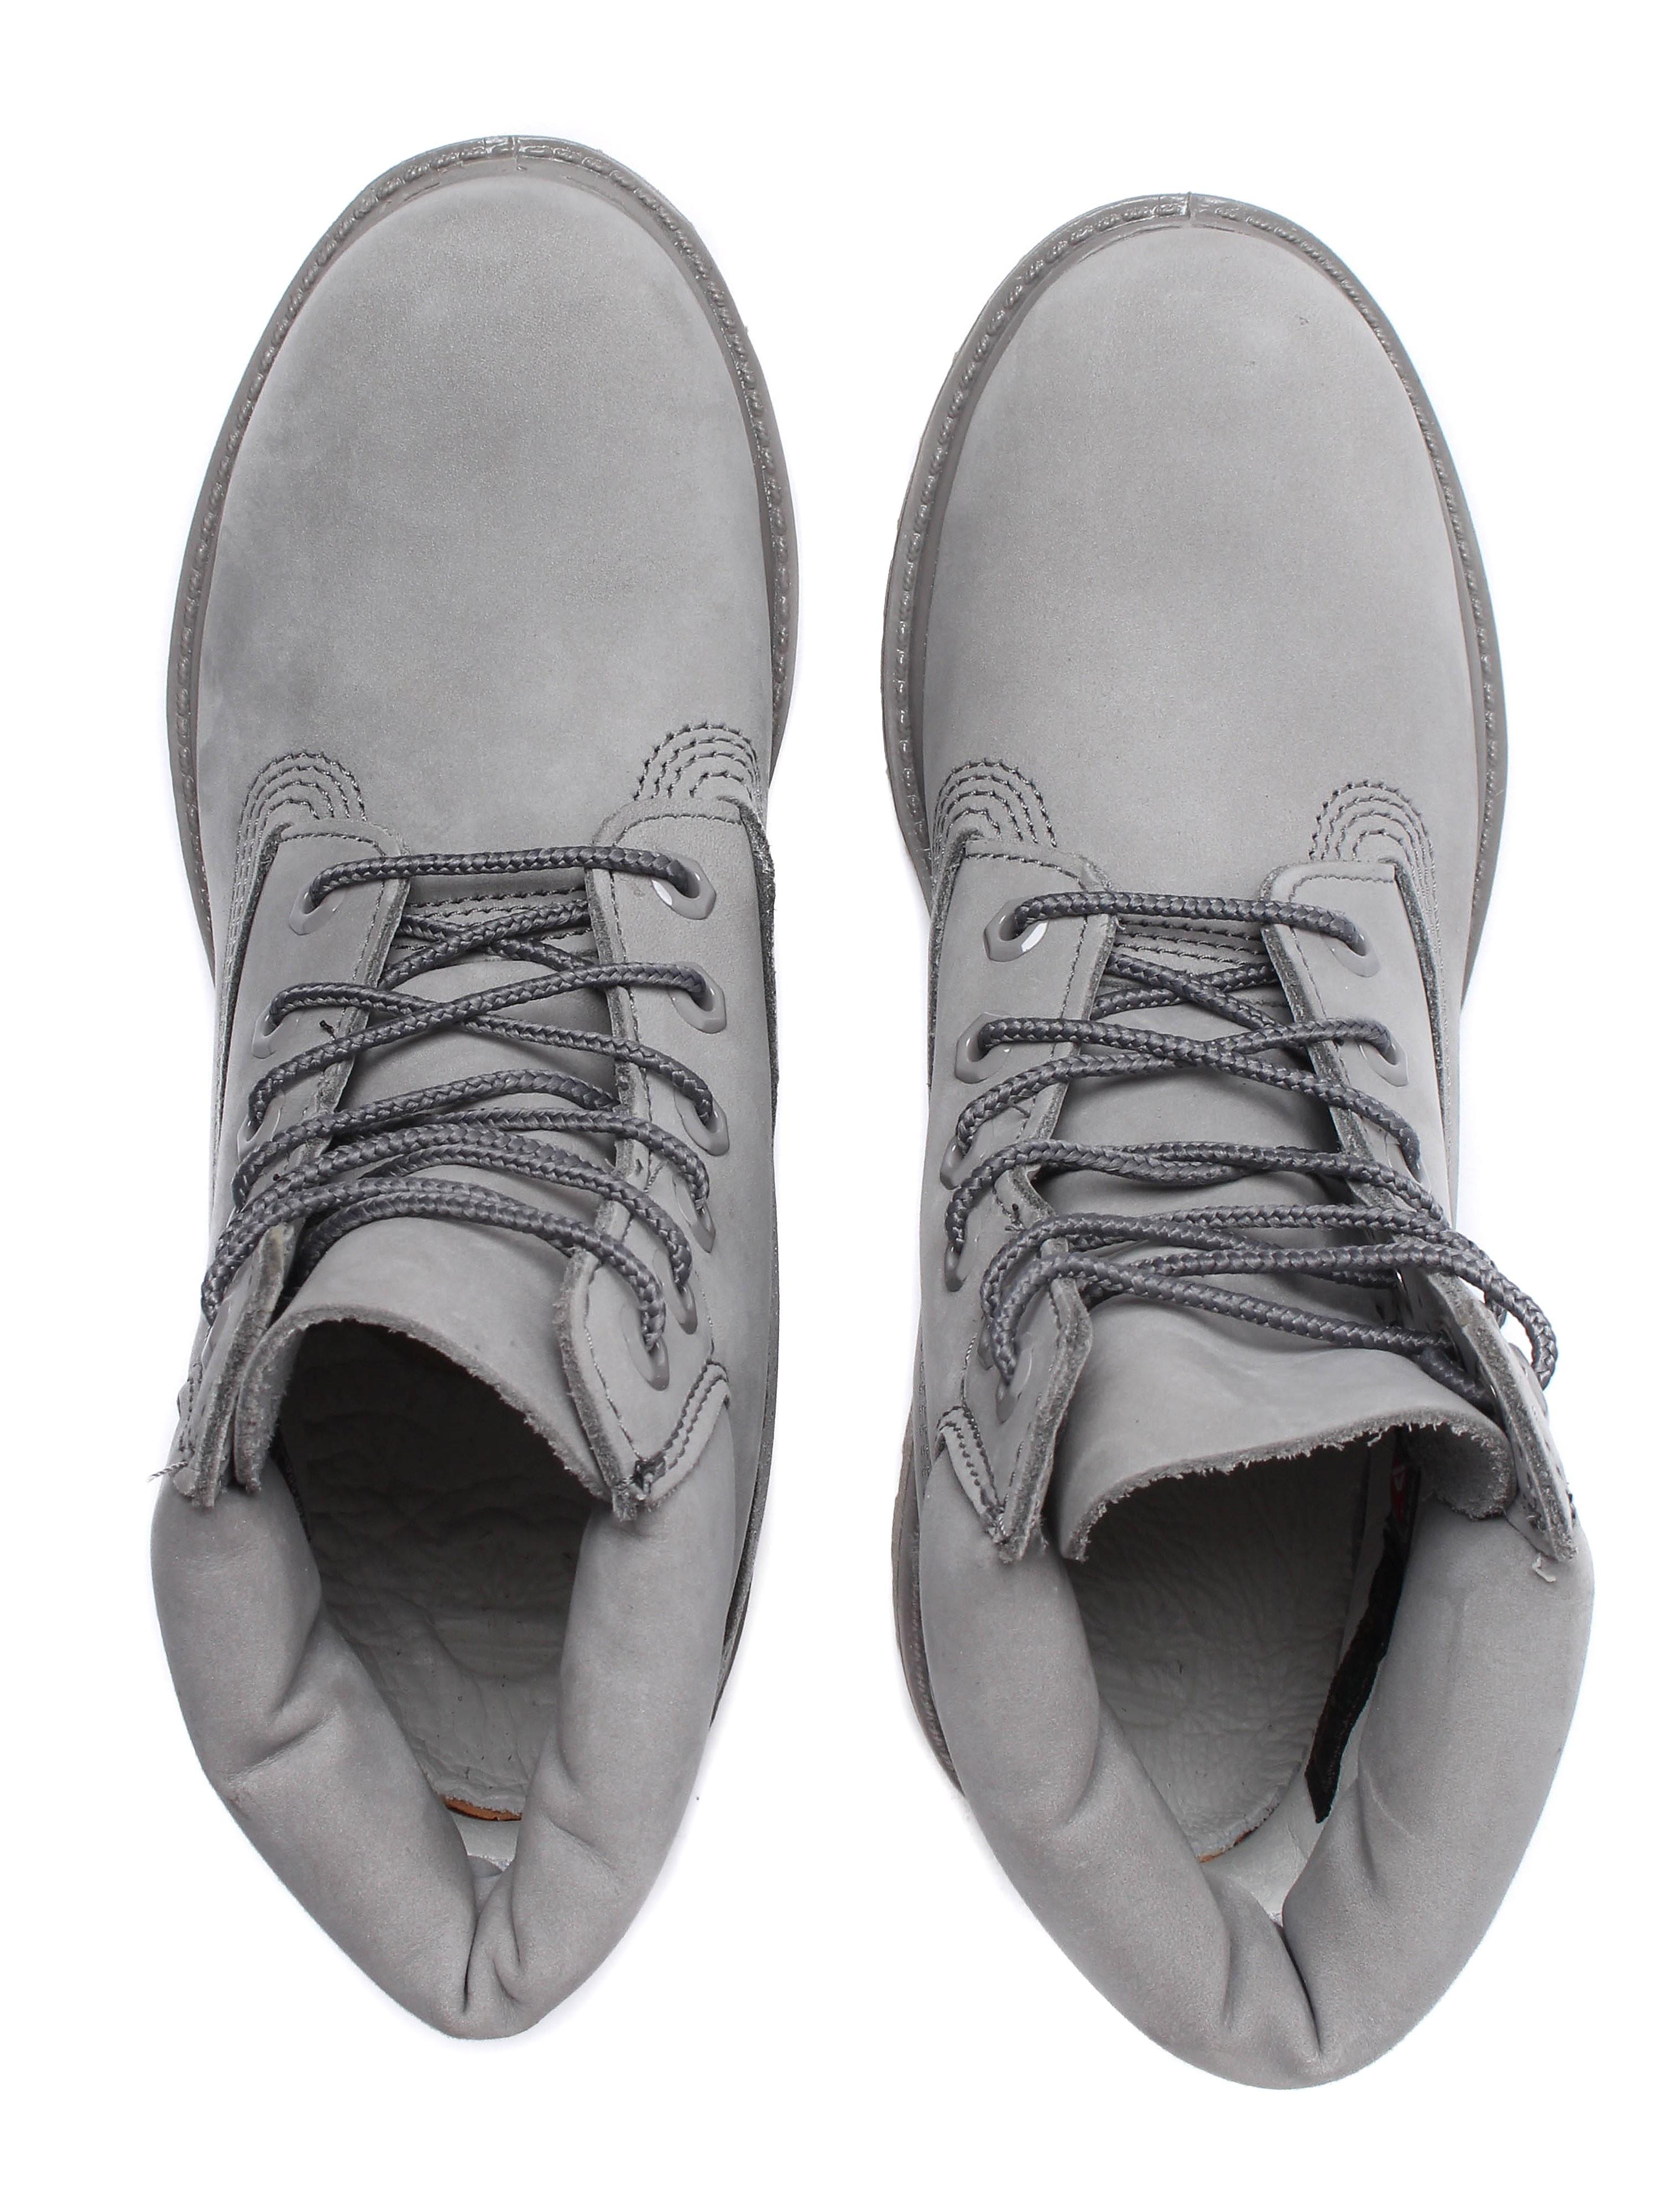 Timberland Women's 6 Inch Premium Boots - Mid Grey Nubuck